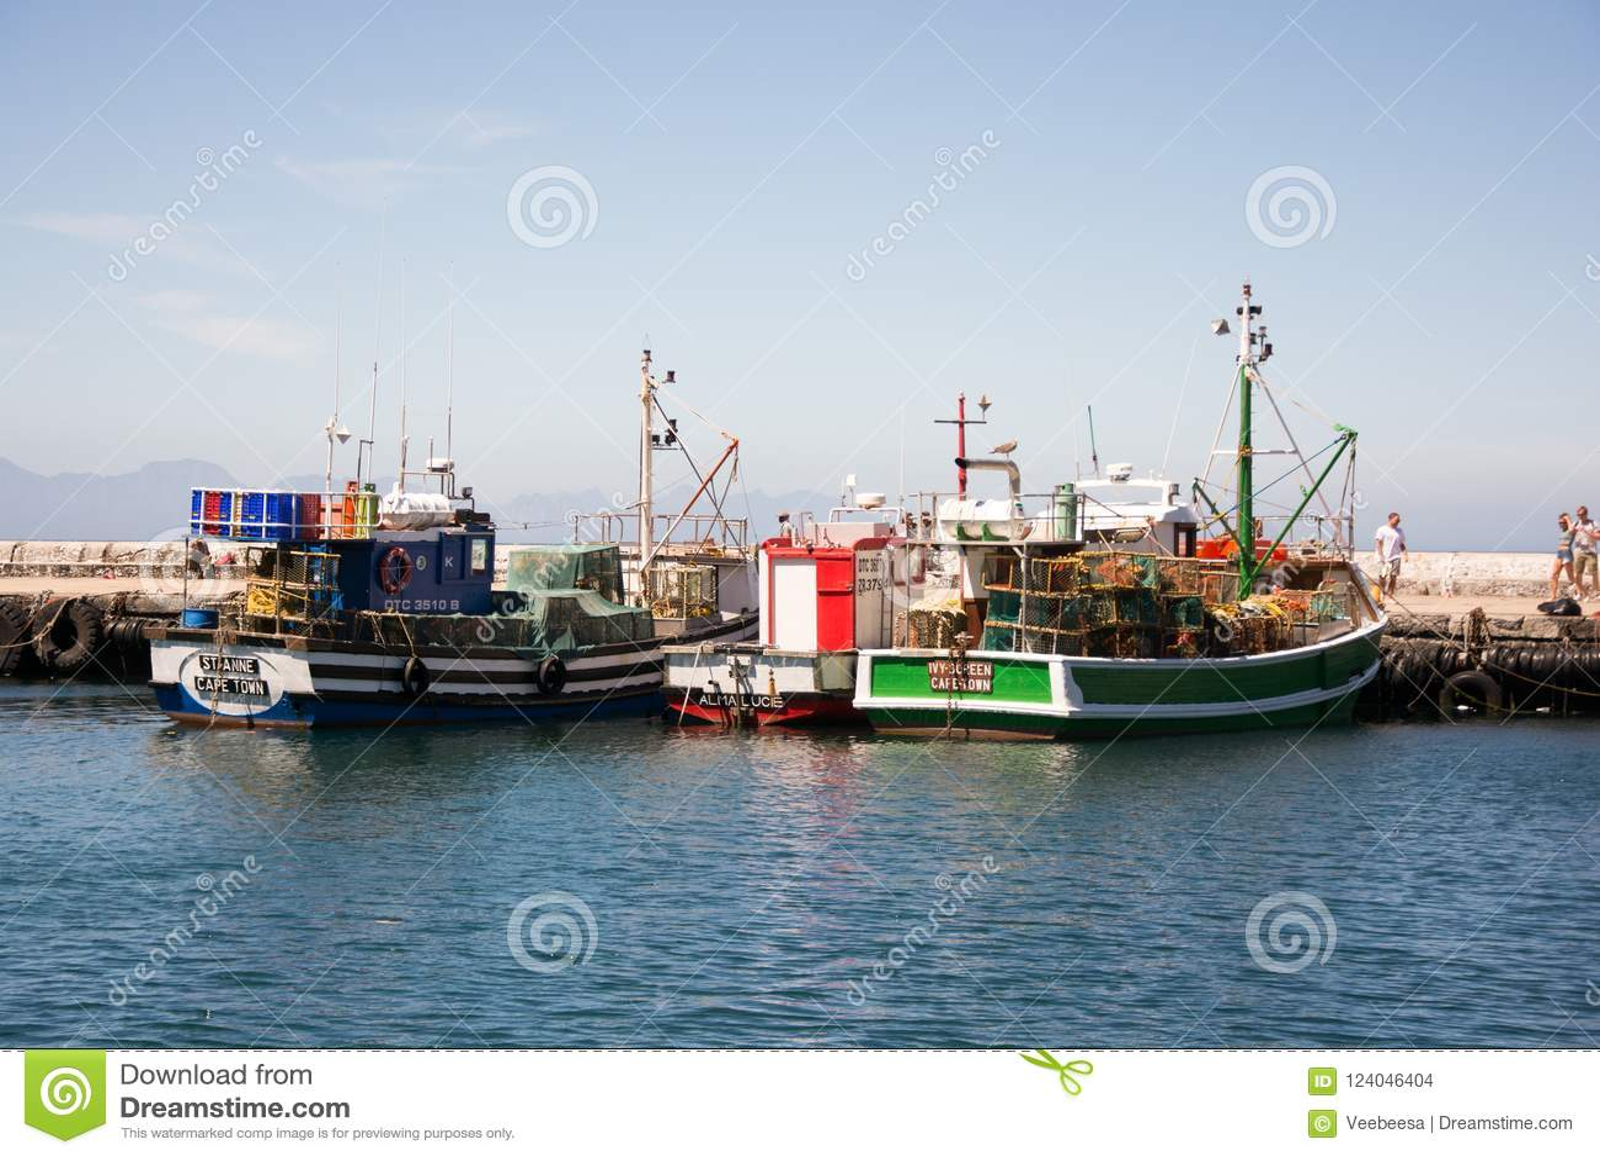 Vissersboten in Kalk-Baai op zonnige dag worden gedokt die